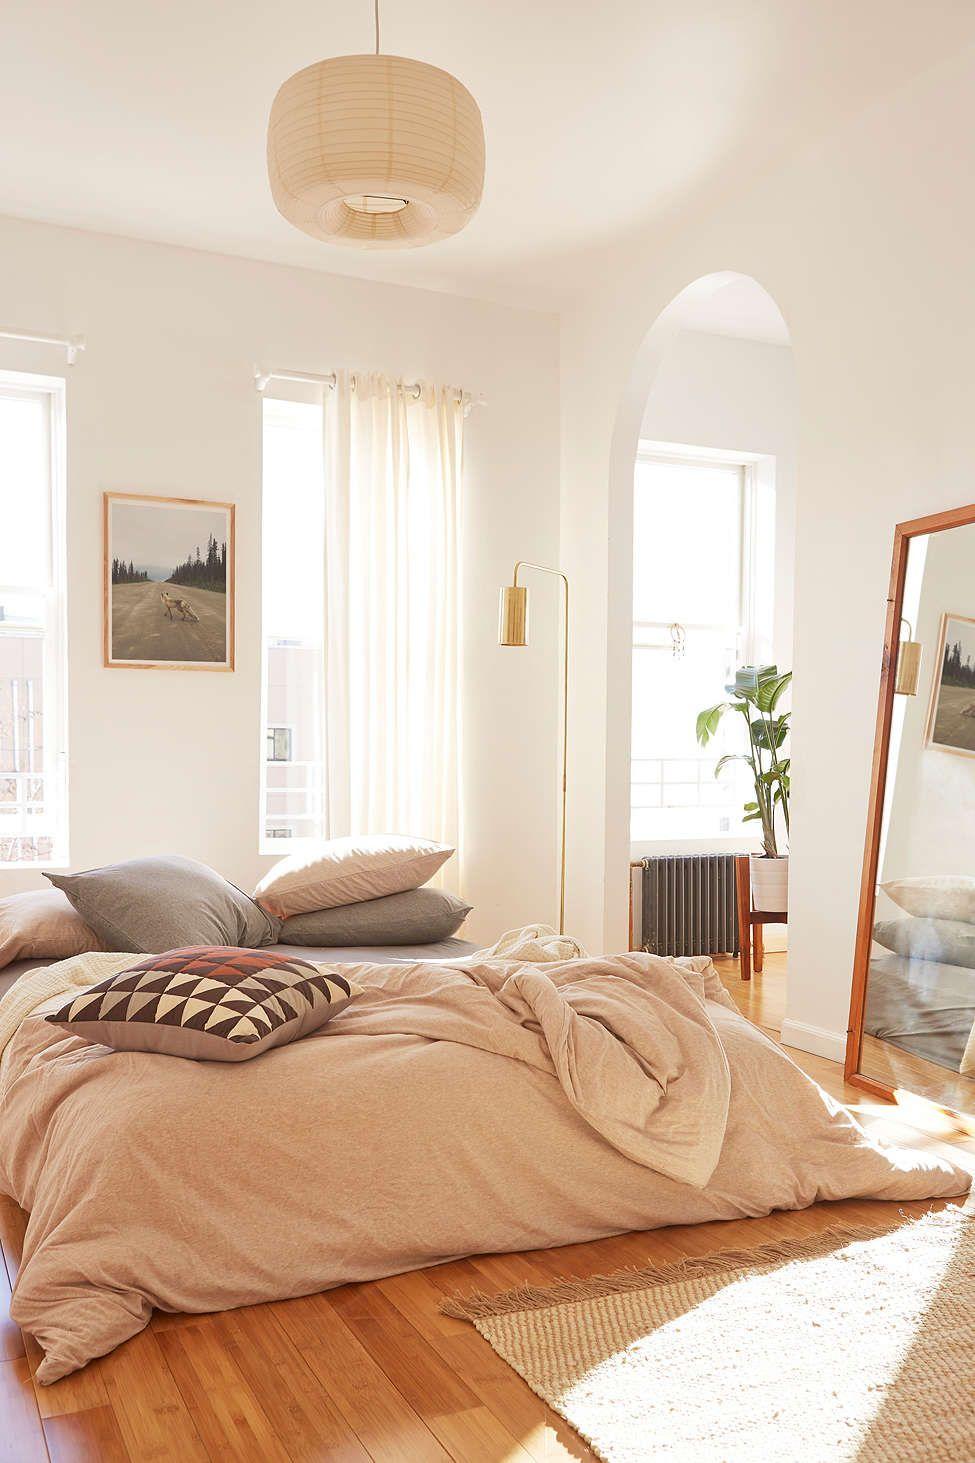 T Shirt Jersey Duvet Cover Bedroom Bedroom Decor Home